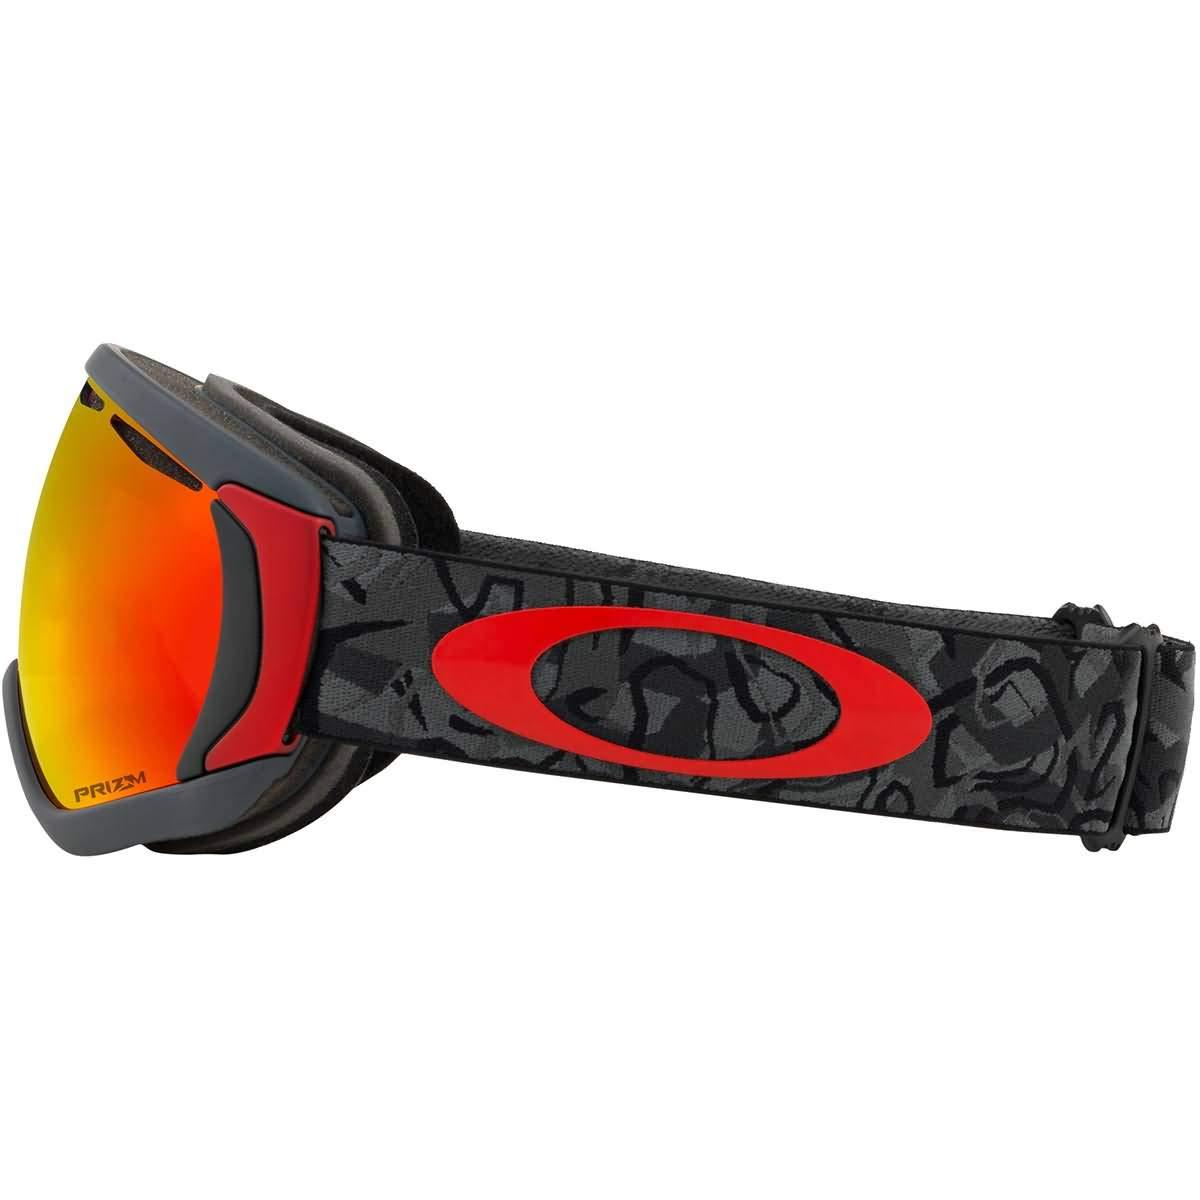 293820082bd8 Amazon.com : Oakley Canopy Snow Goggle, Camo Vine Night, Large : Sports &  Outdoors